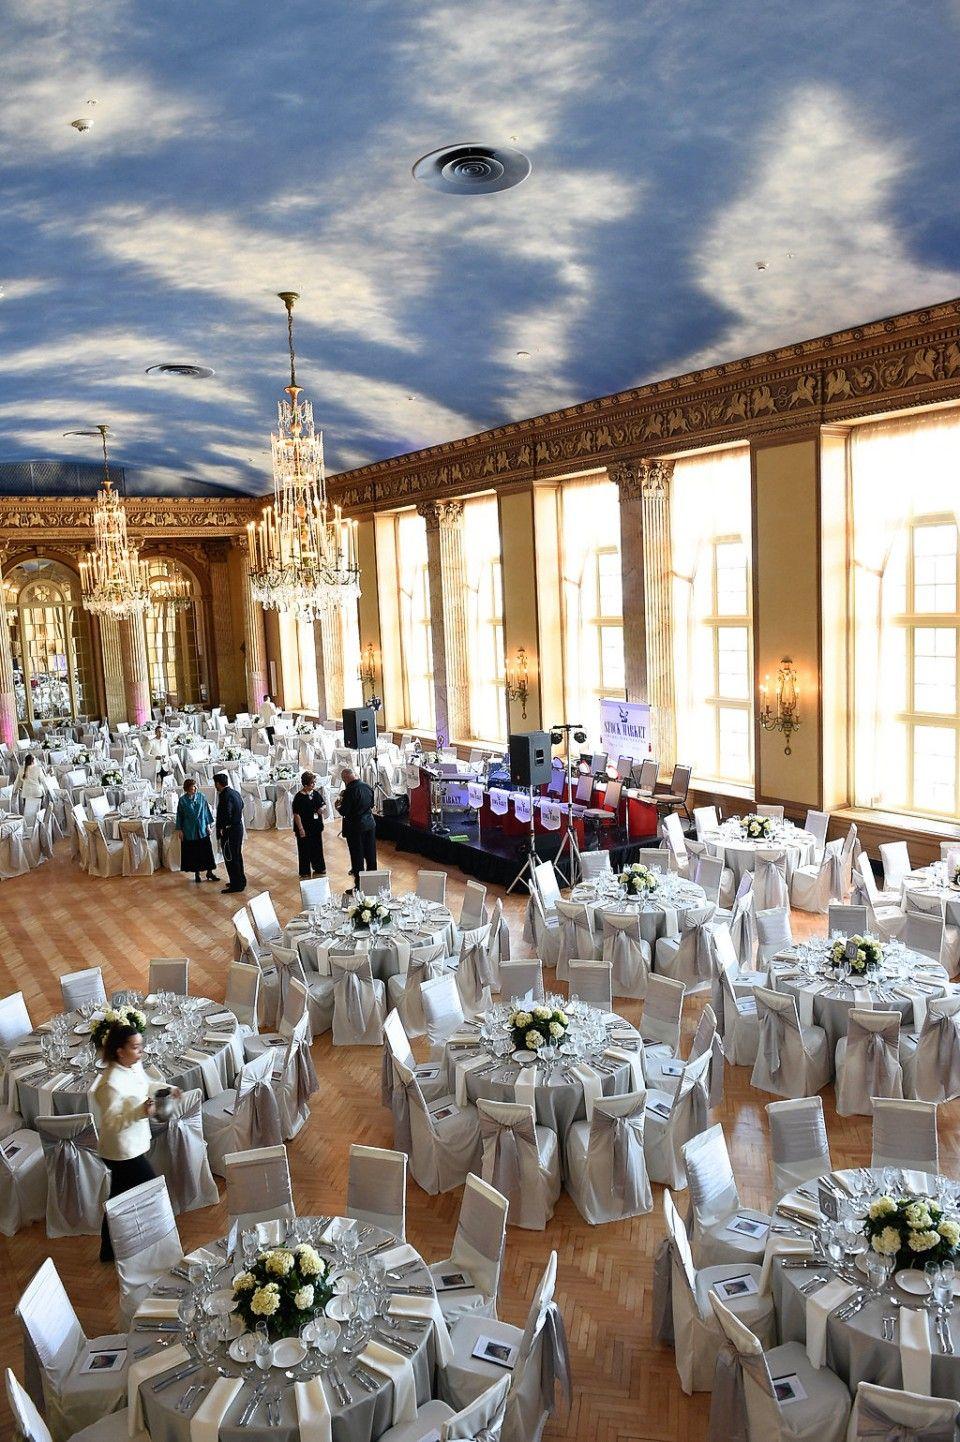 1 000 Celebrate Hotel Syracuse' Revival 'cuse